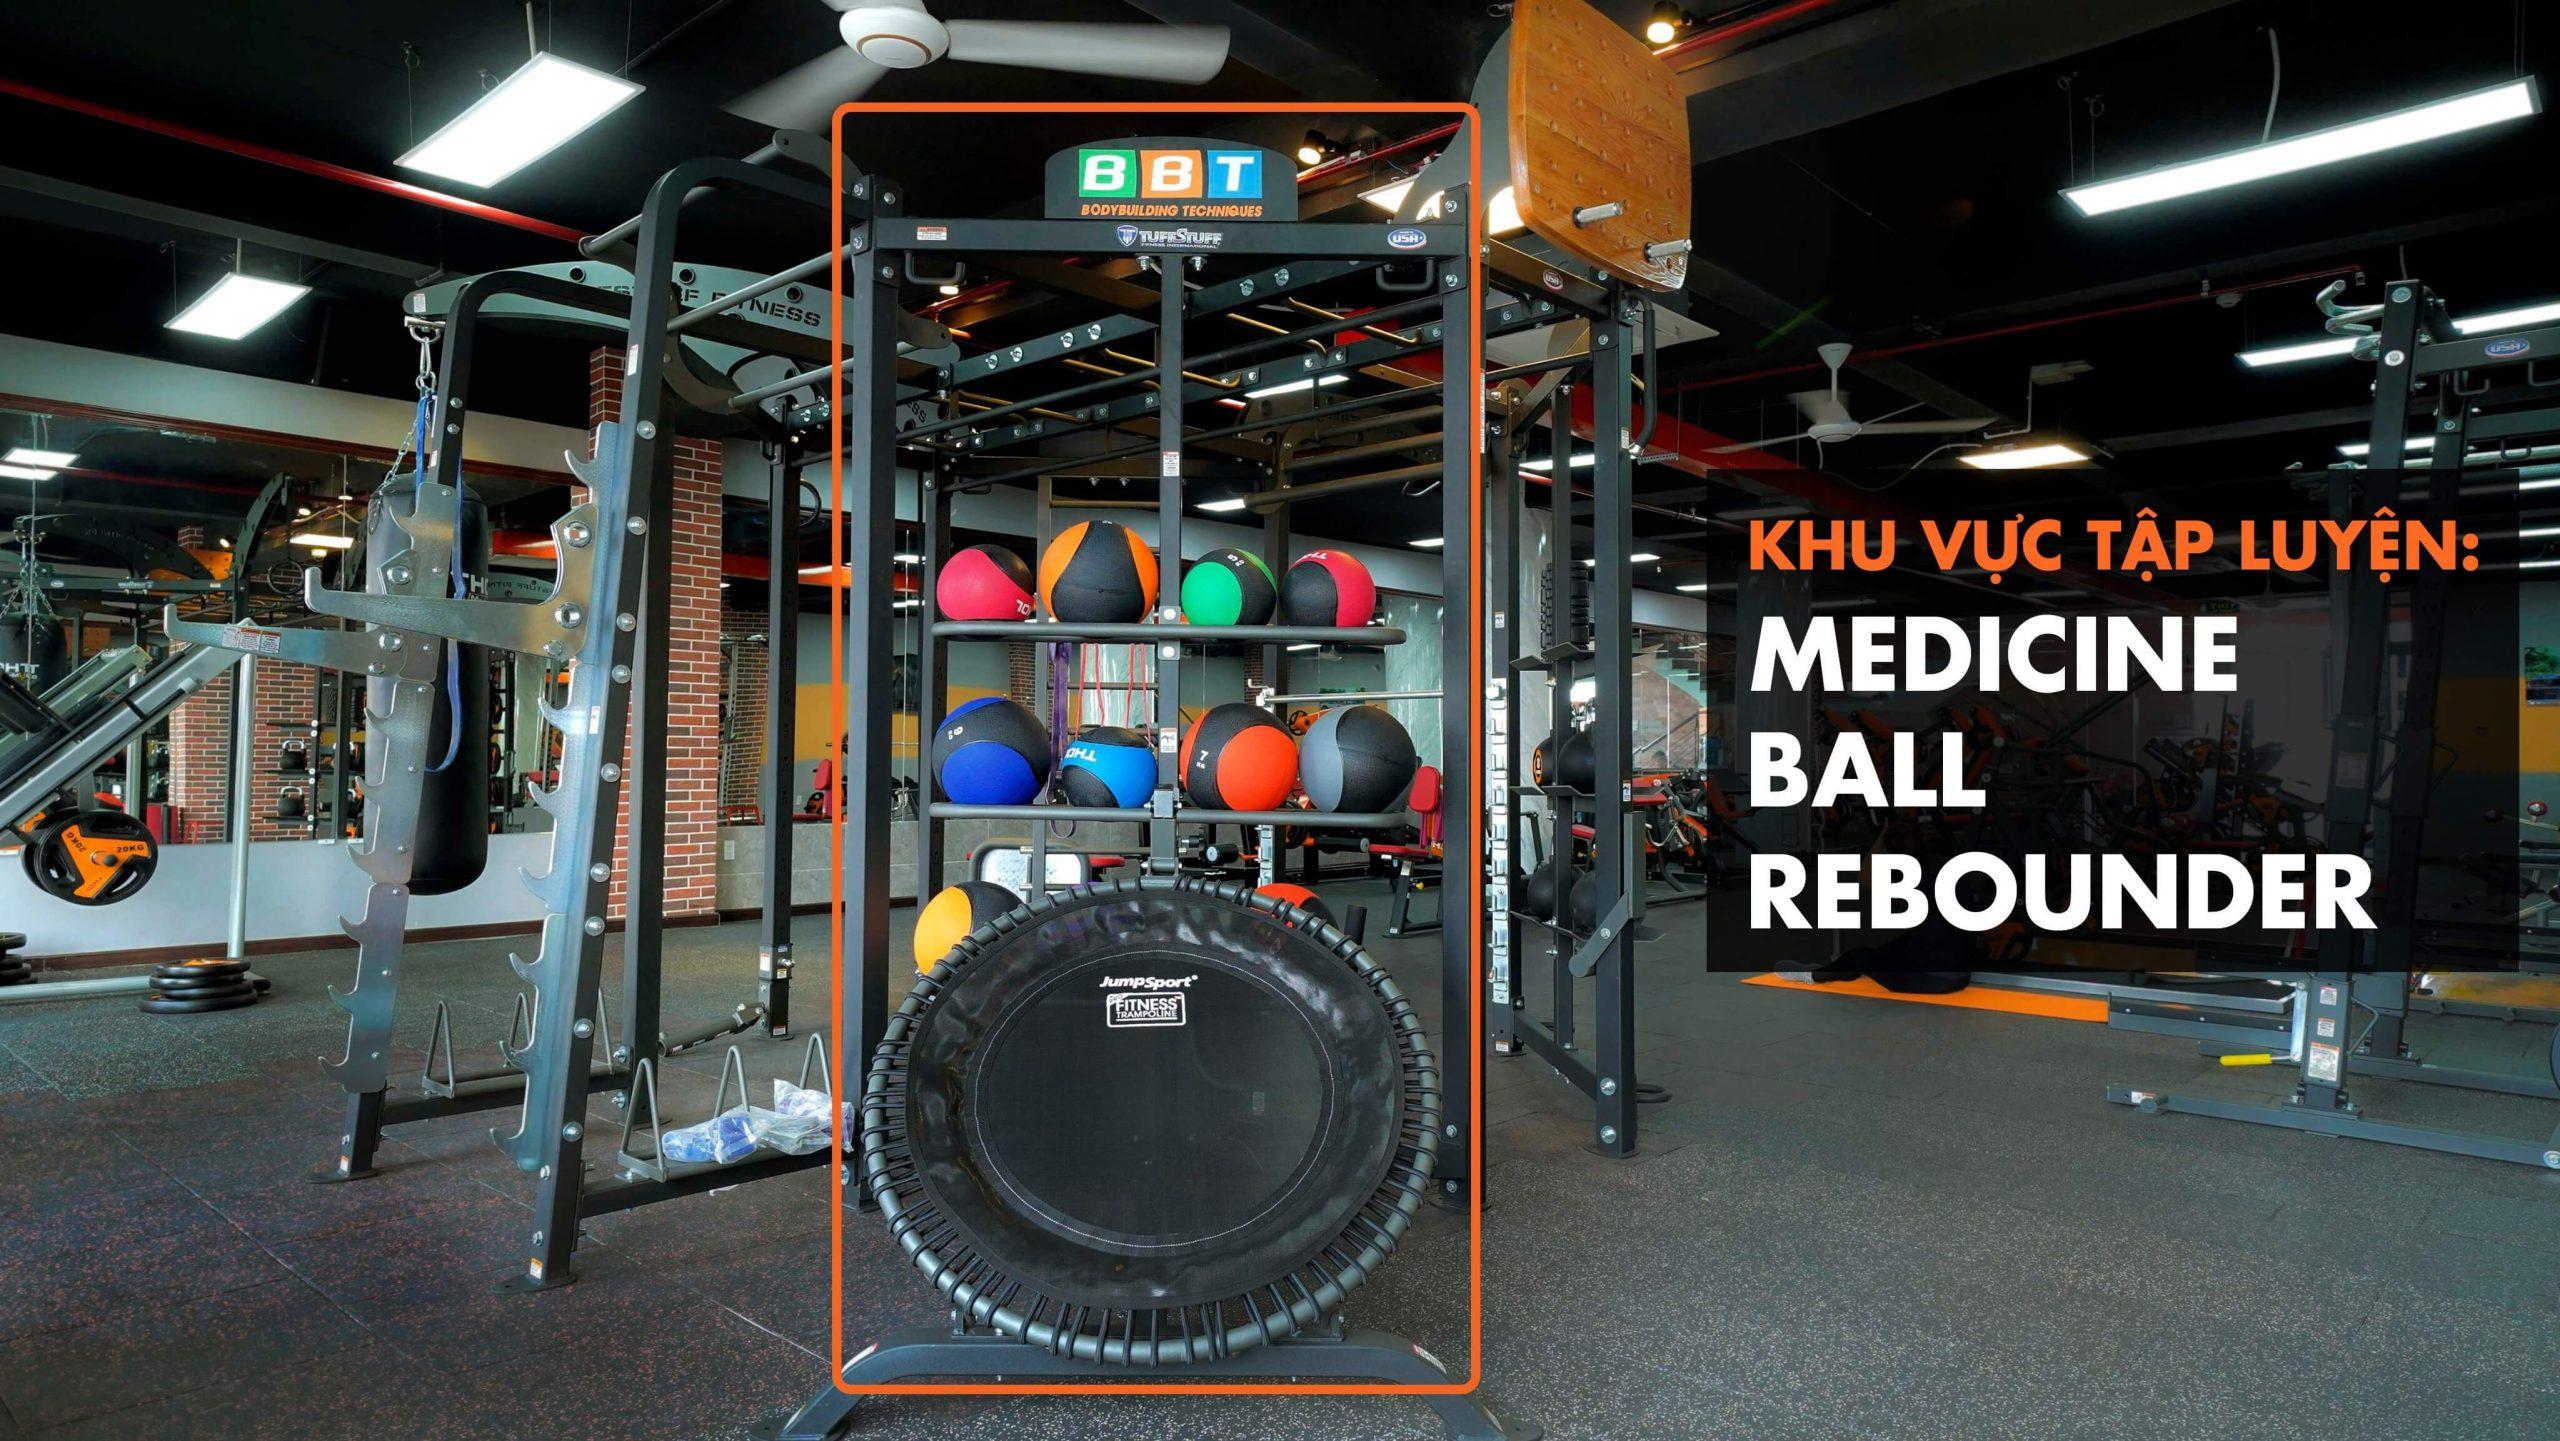 Khu vực tập luyệnMedicine Ball Rebounder.